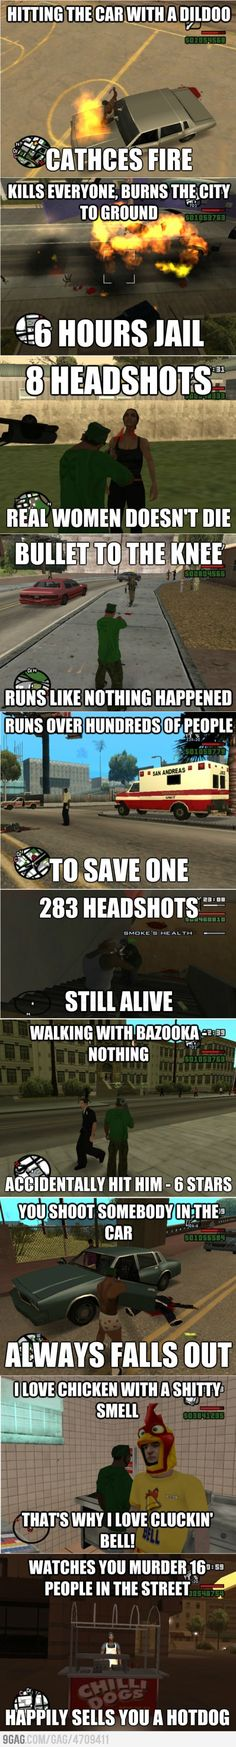 GTA SA logic...bahahhah! love this gameeee!